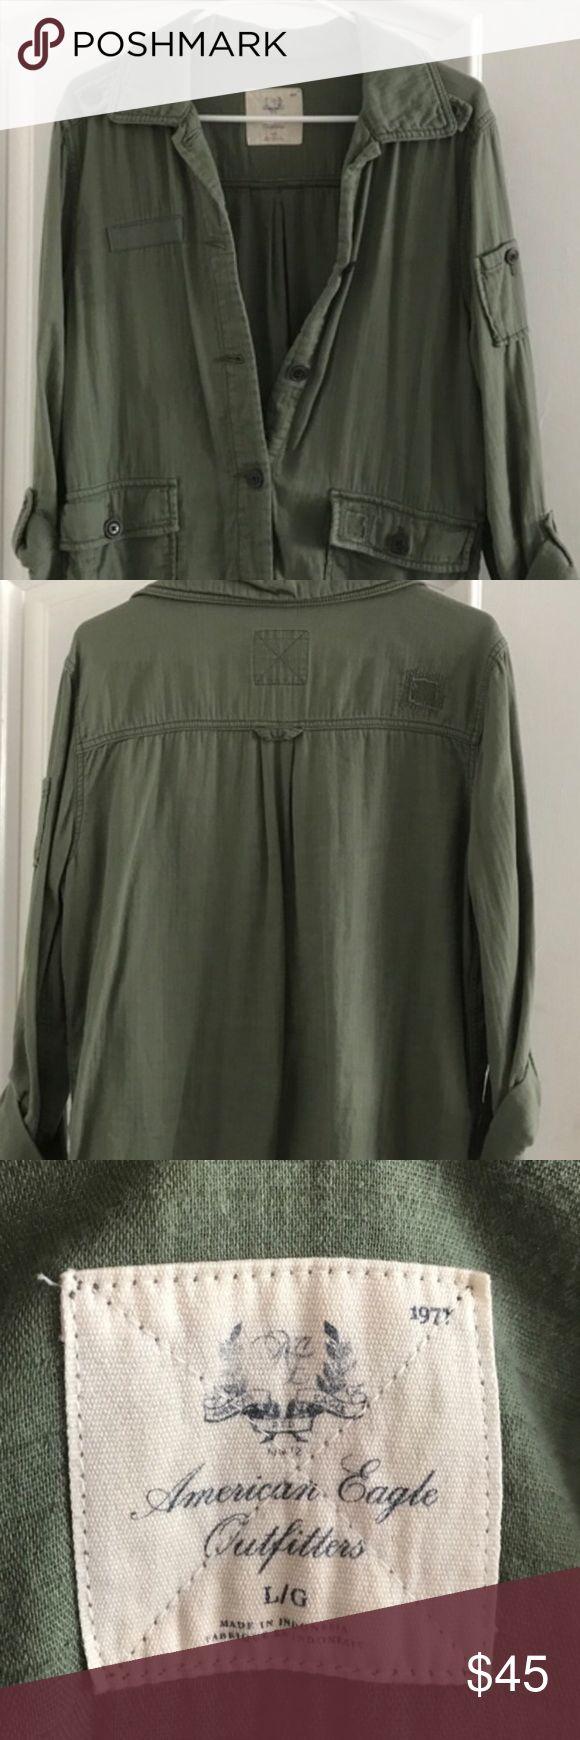 American Eagle Jacket American Eagle Jacket American Eagle Outfitters Jackets & Coats Utility Jackets